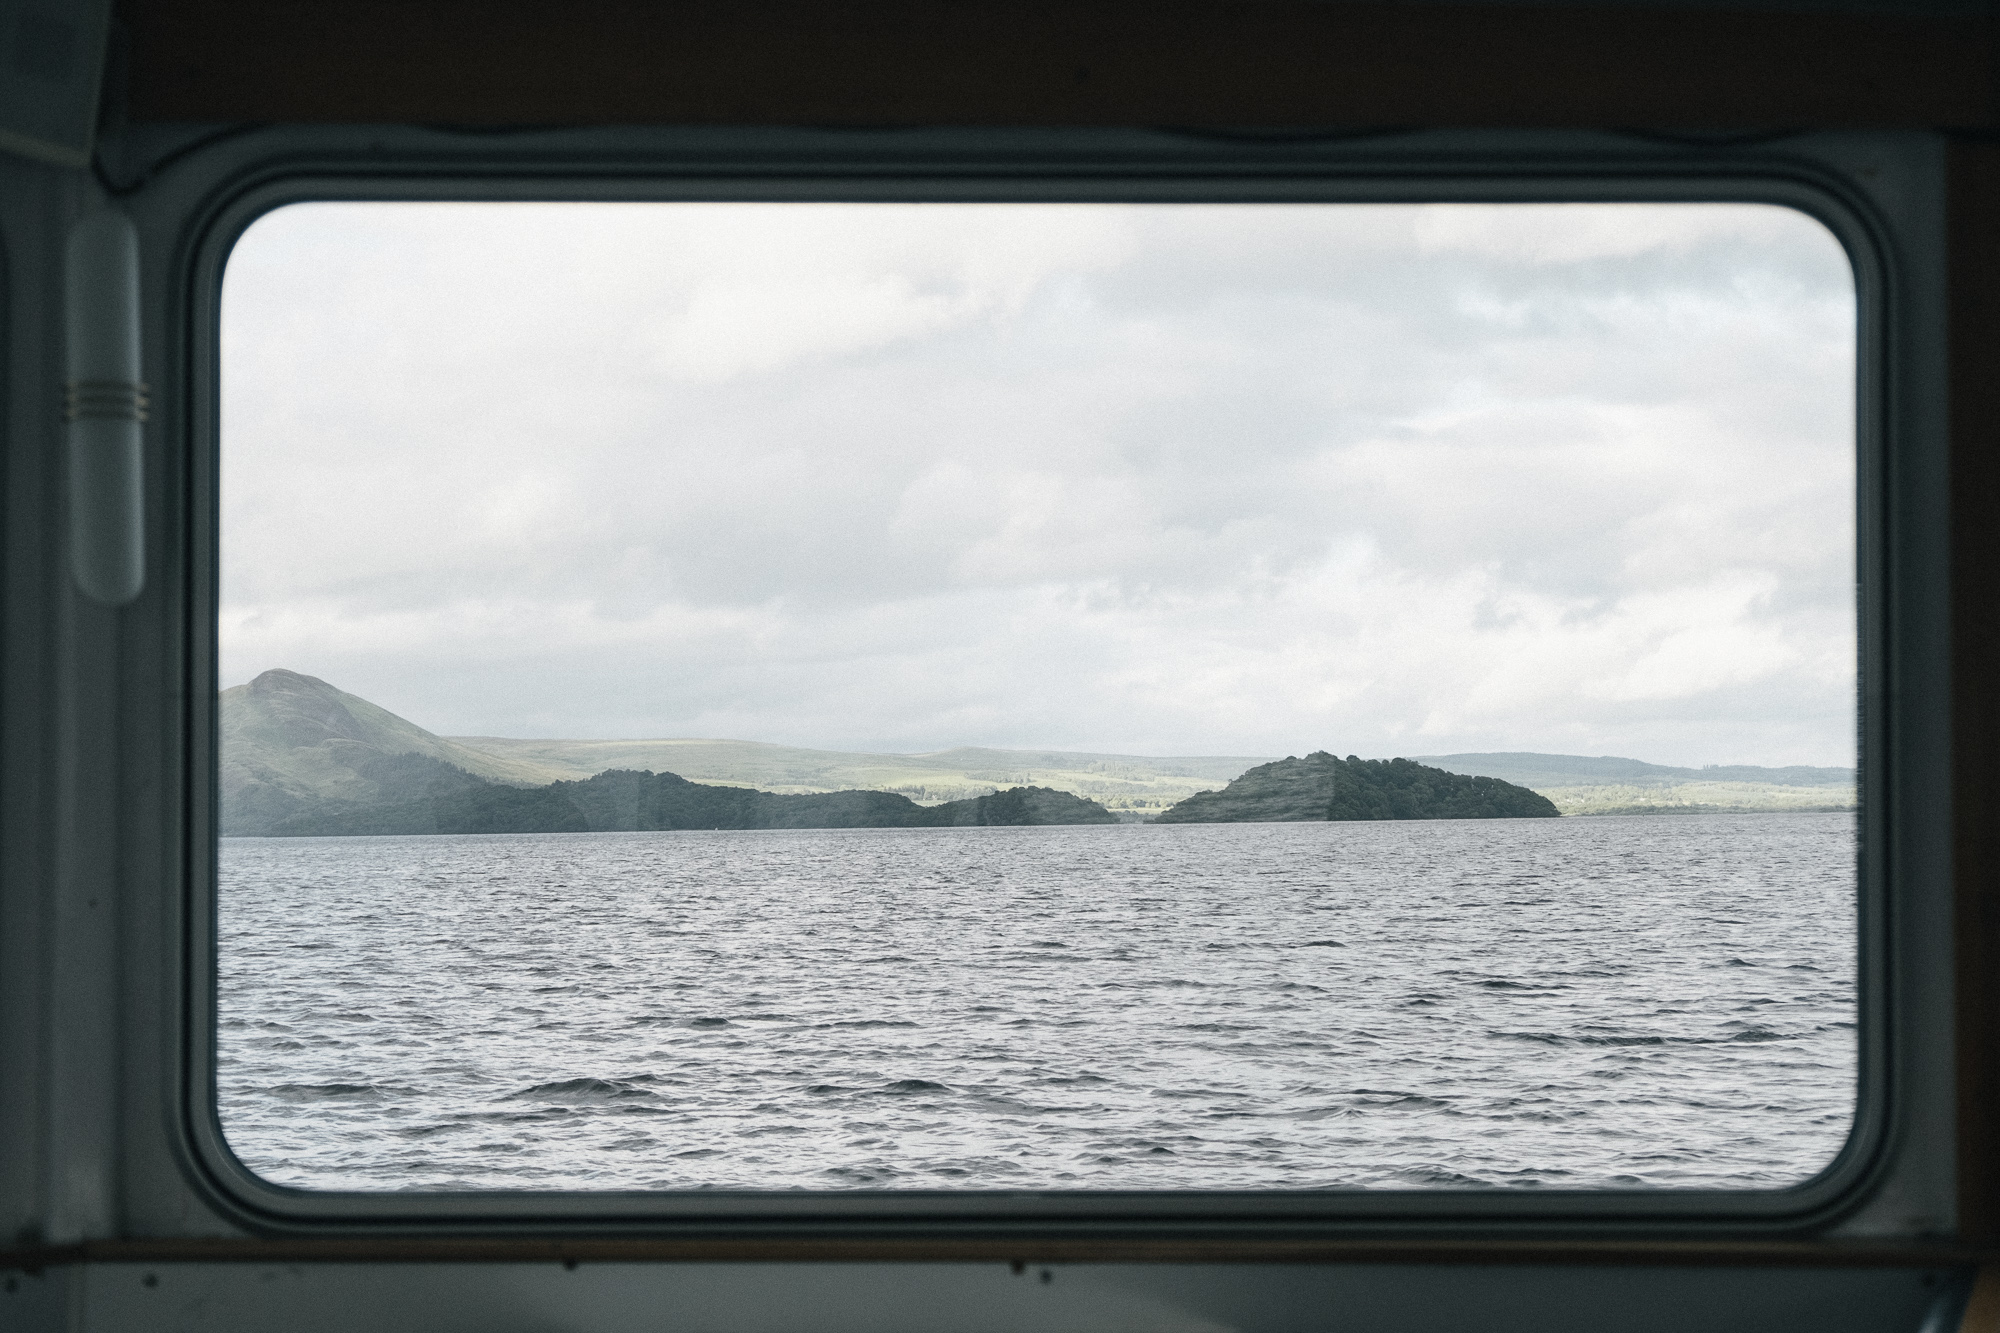 Scotland-trip-best-places-Sunset-Cruise-on-Loch-Lomond-26.jpg